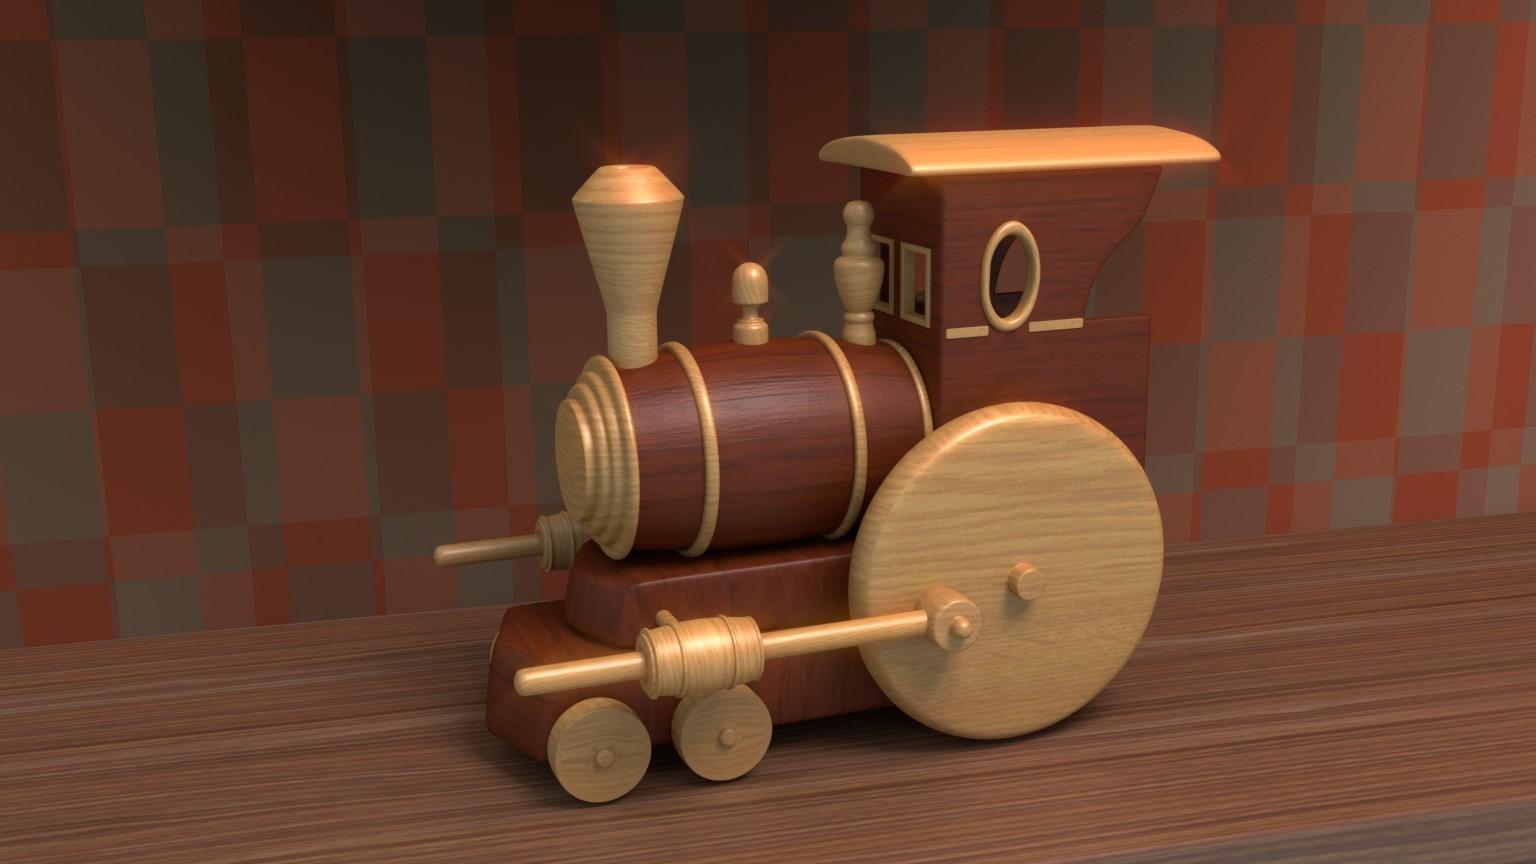 Tren madera juguete 2-trenecito_6.jpg